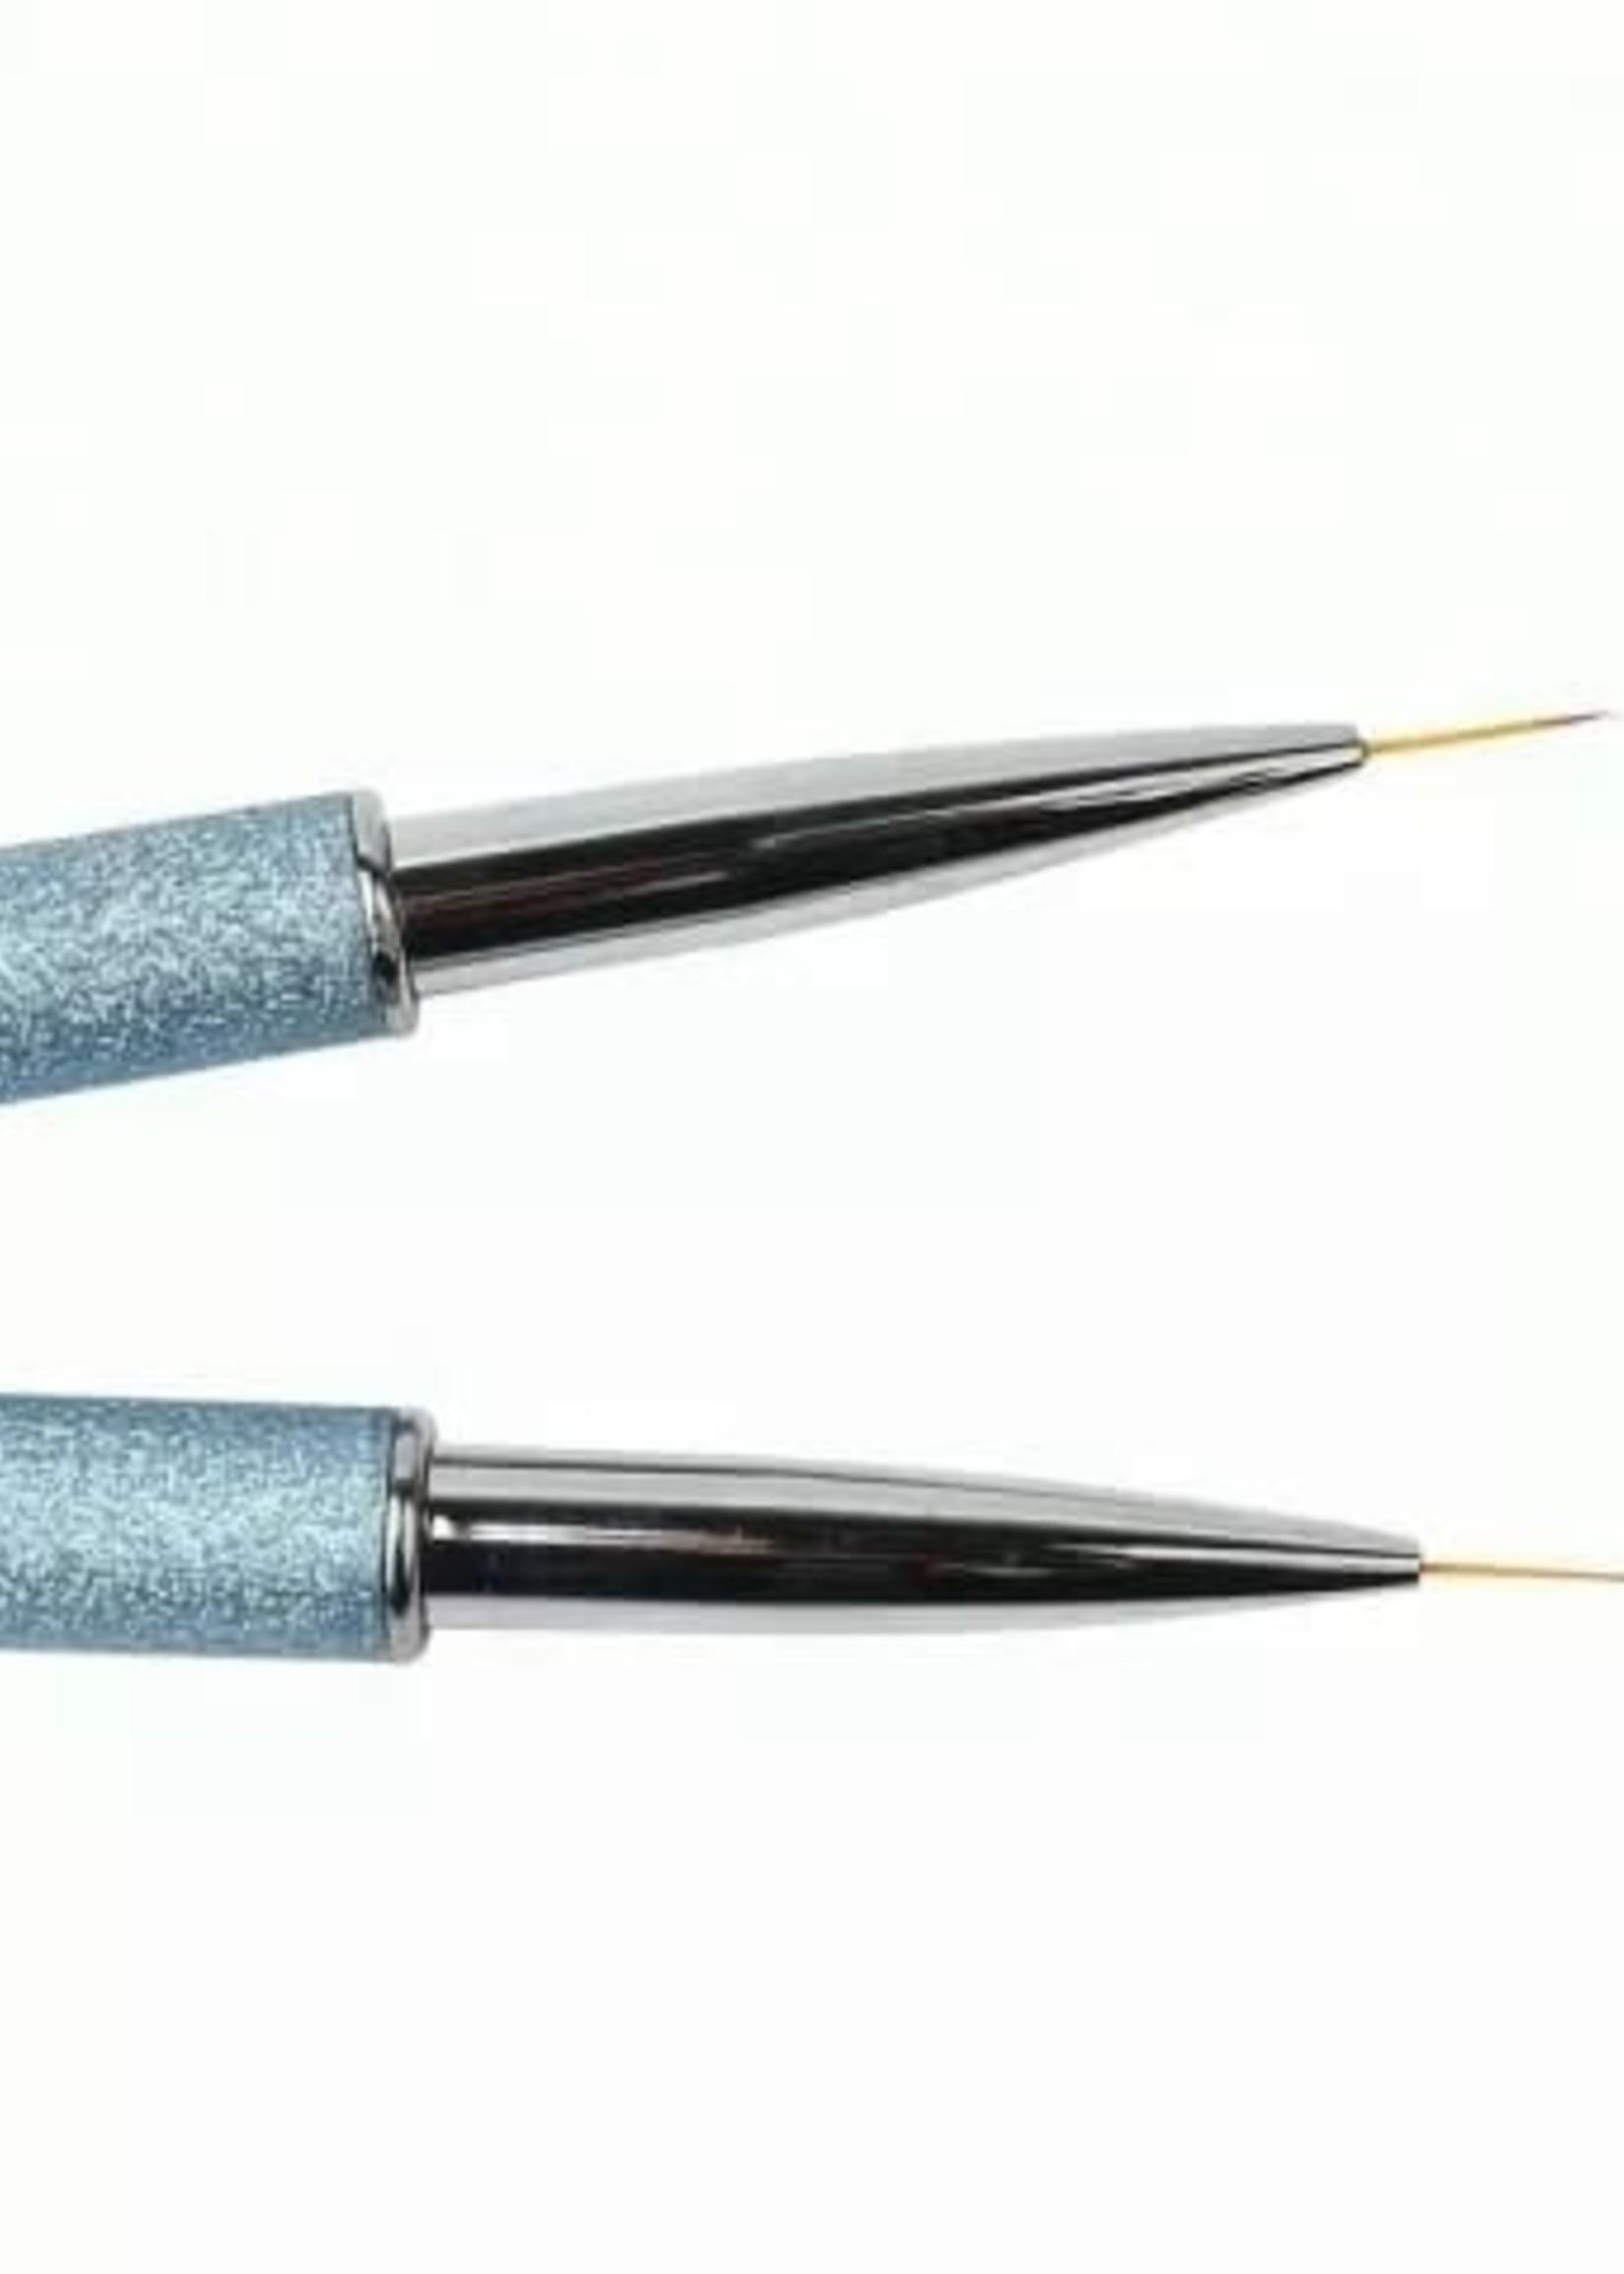 Nail art brush 9 mm